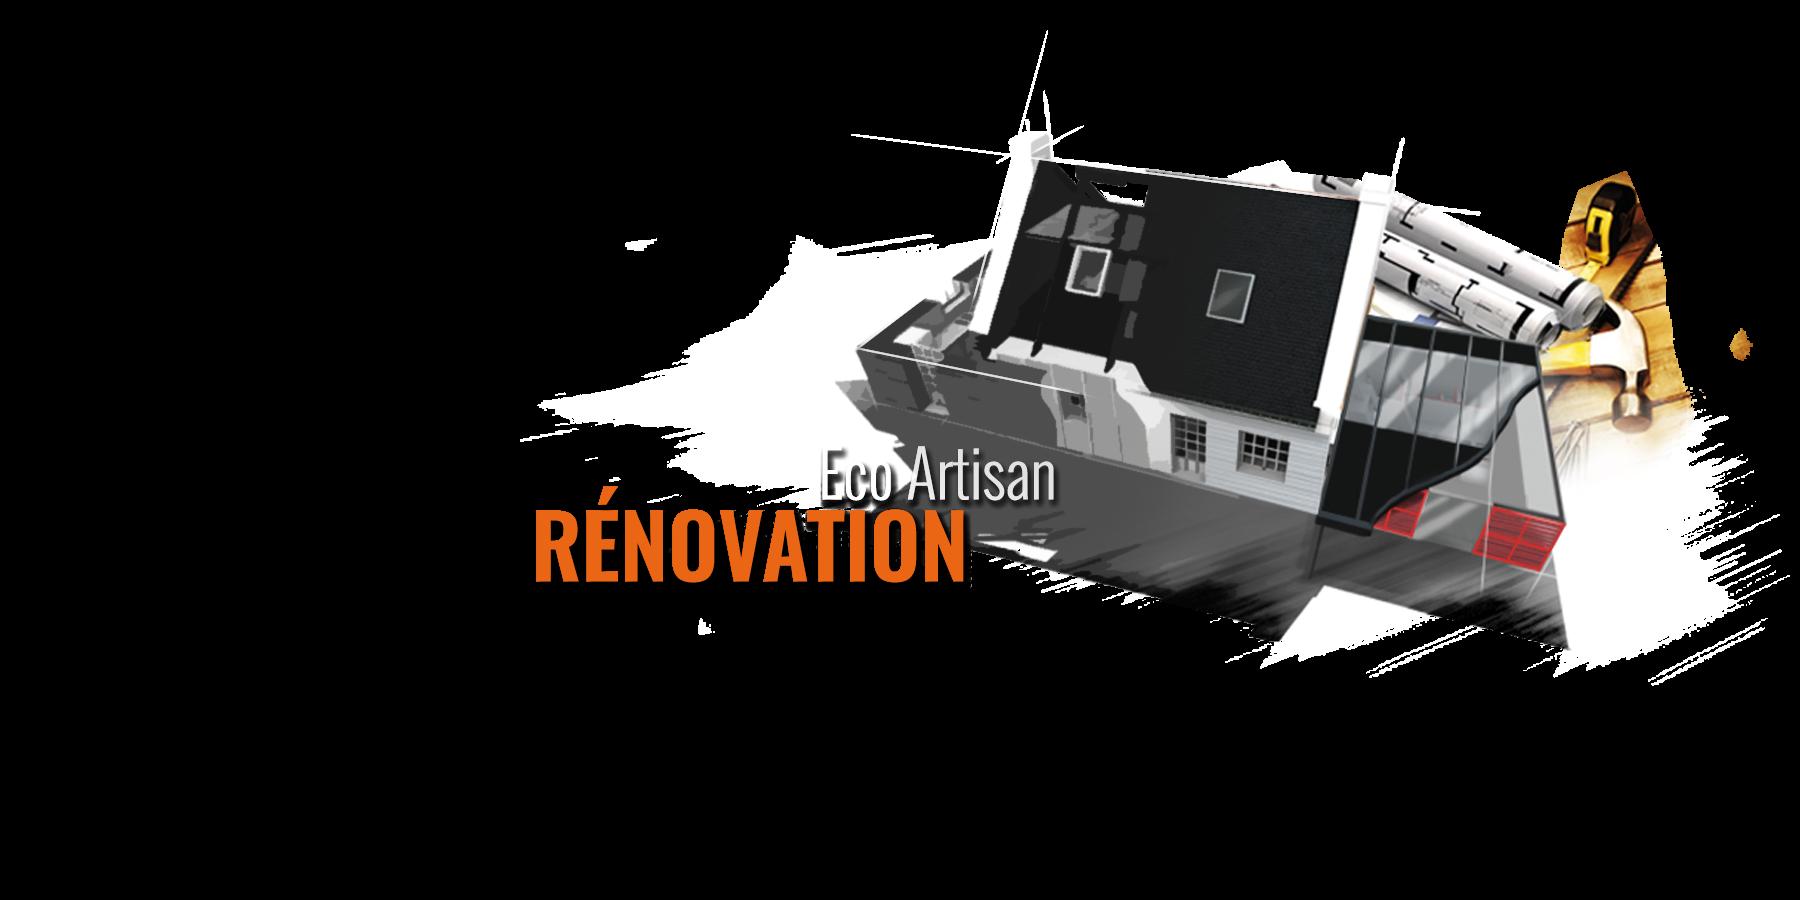 r isol entreprise sp cialis e isolation comble r novation menuiserie eco artisan angers maine. Black Bedroom Furniture Sets. Home Design Ideas